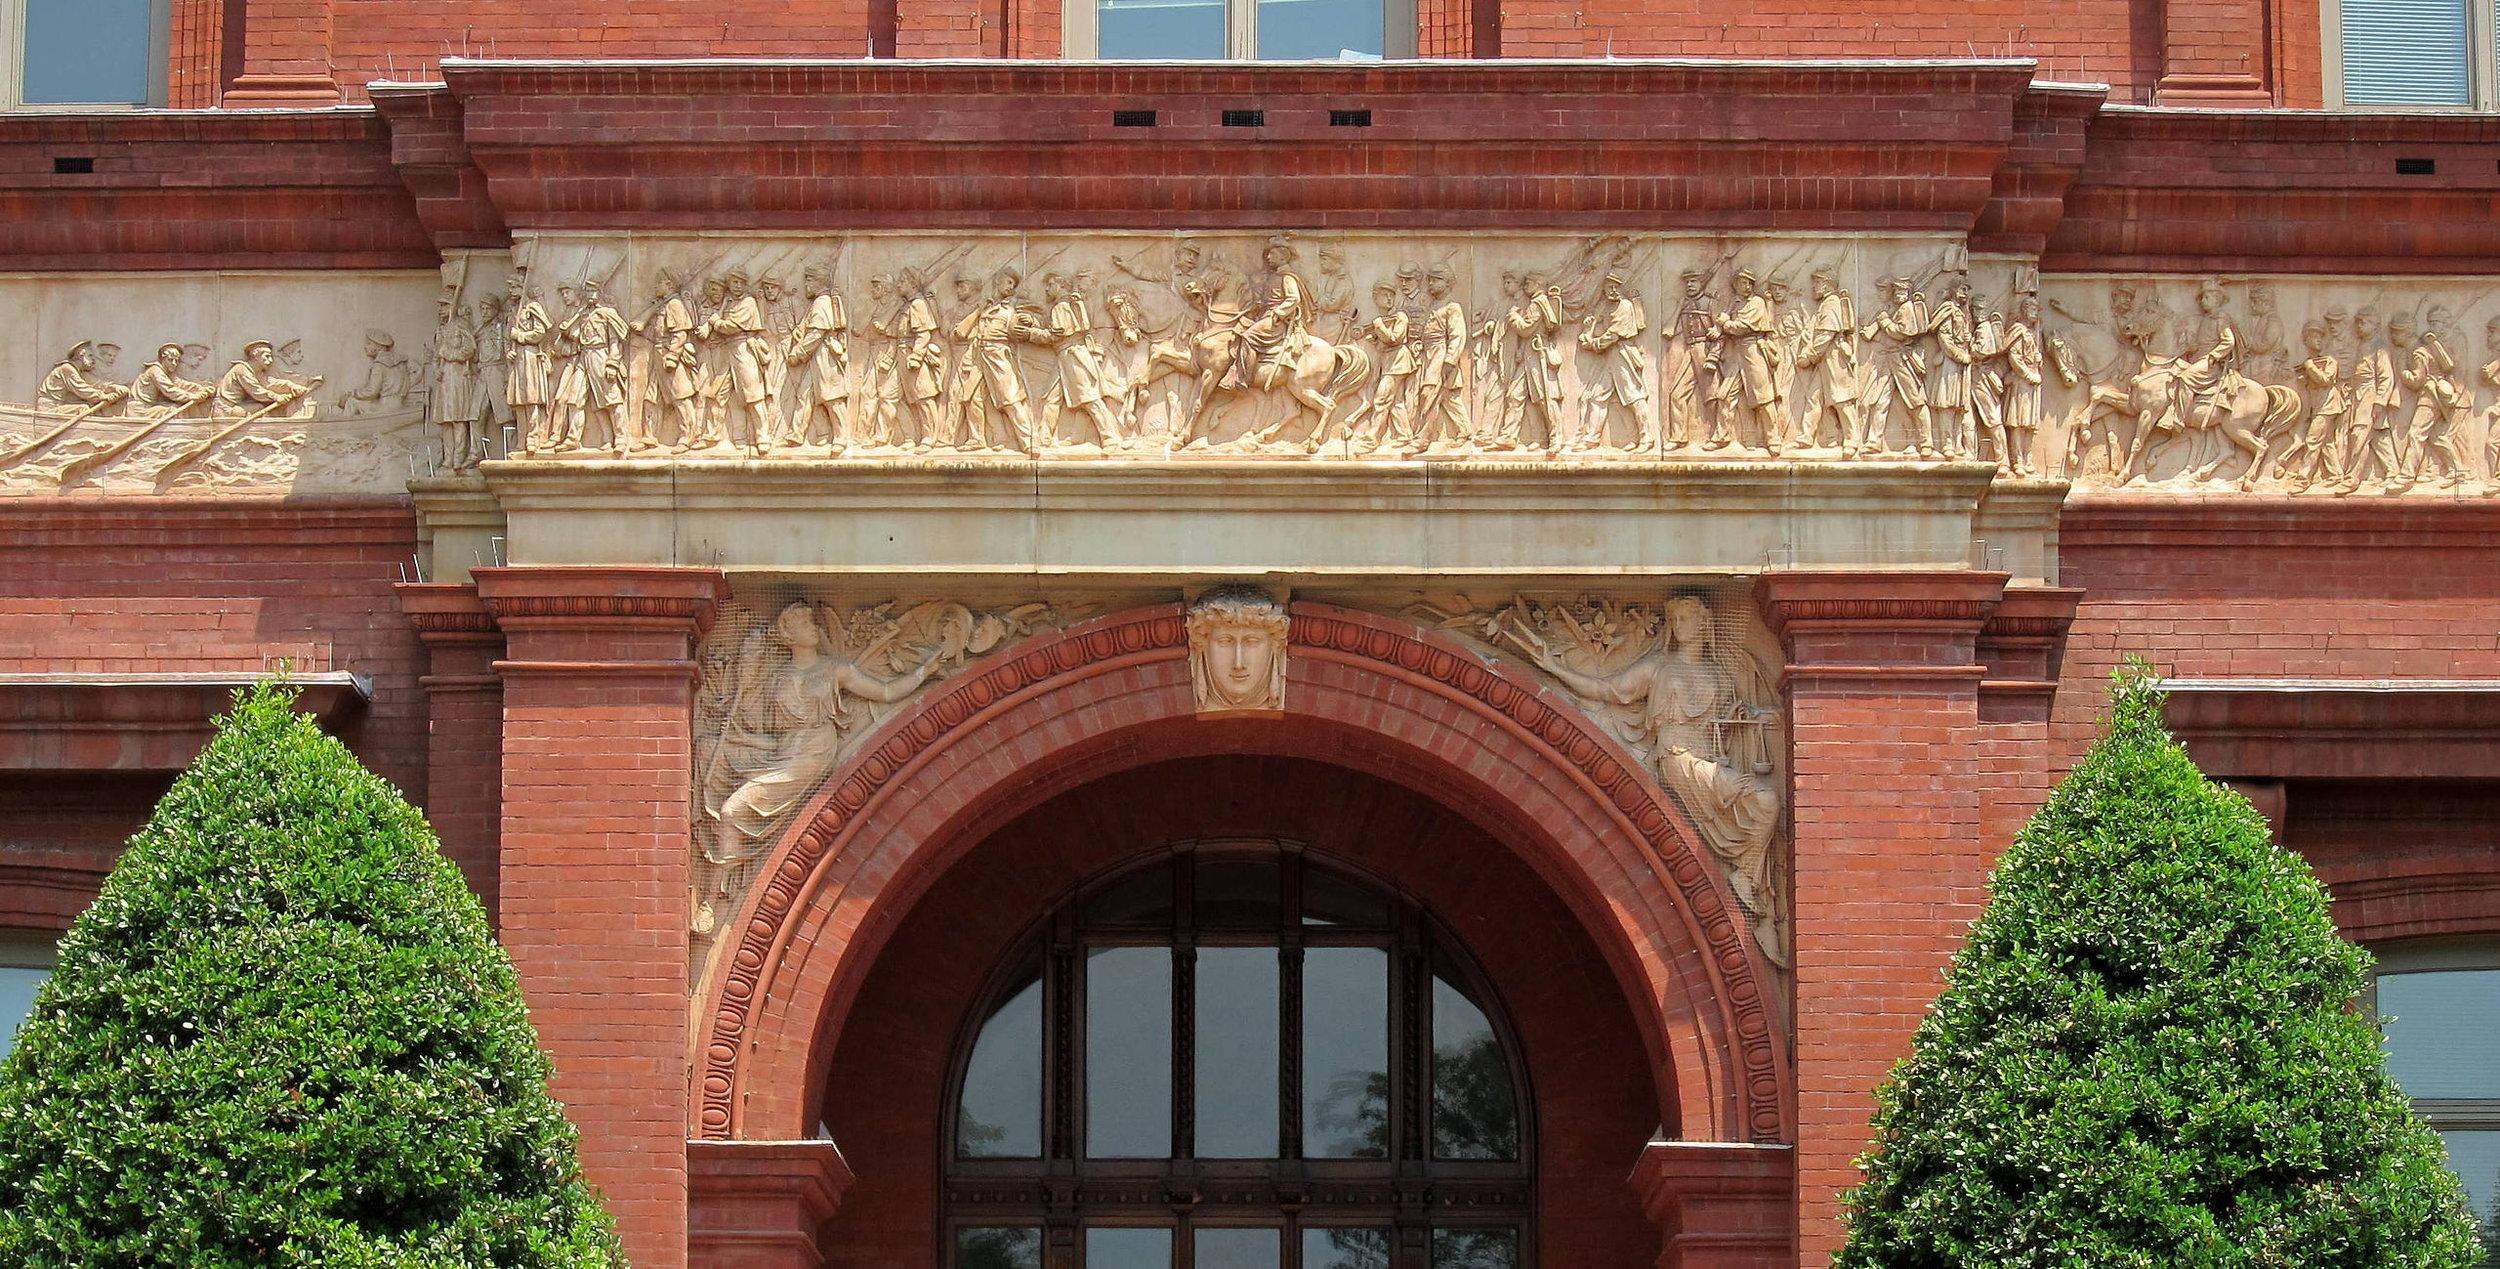 National_Building_Museum_frieze.JPG